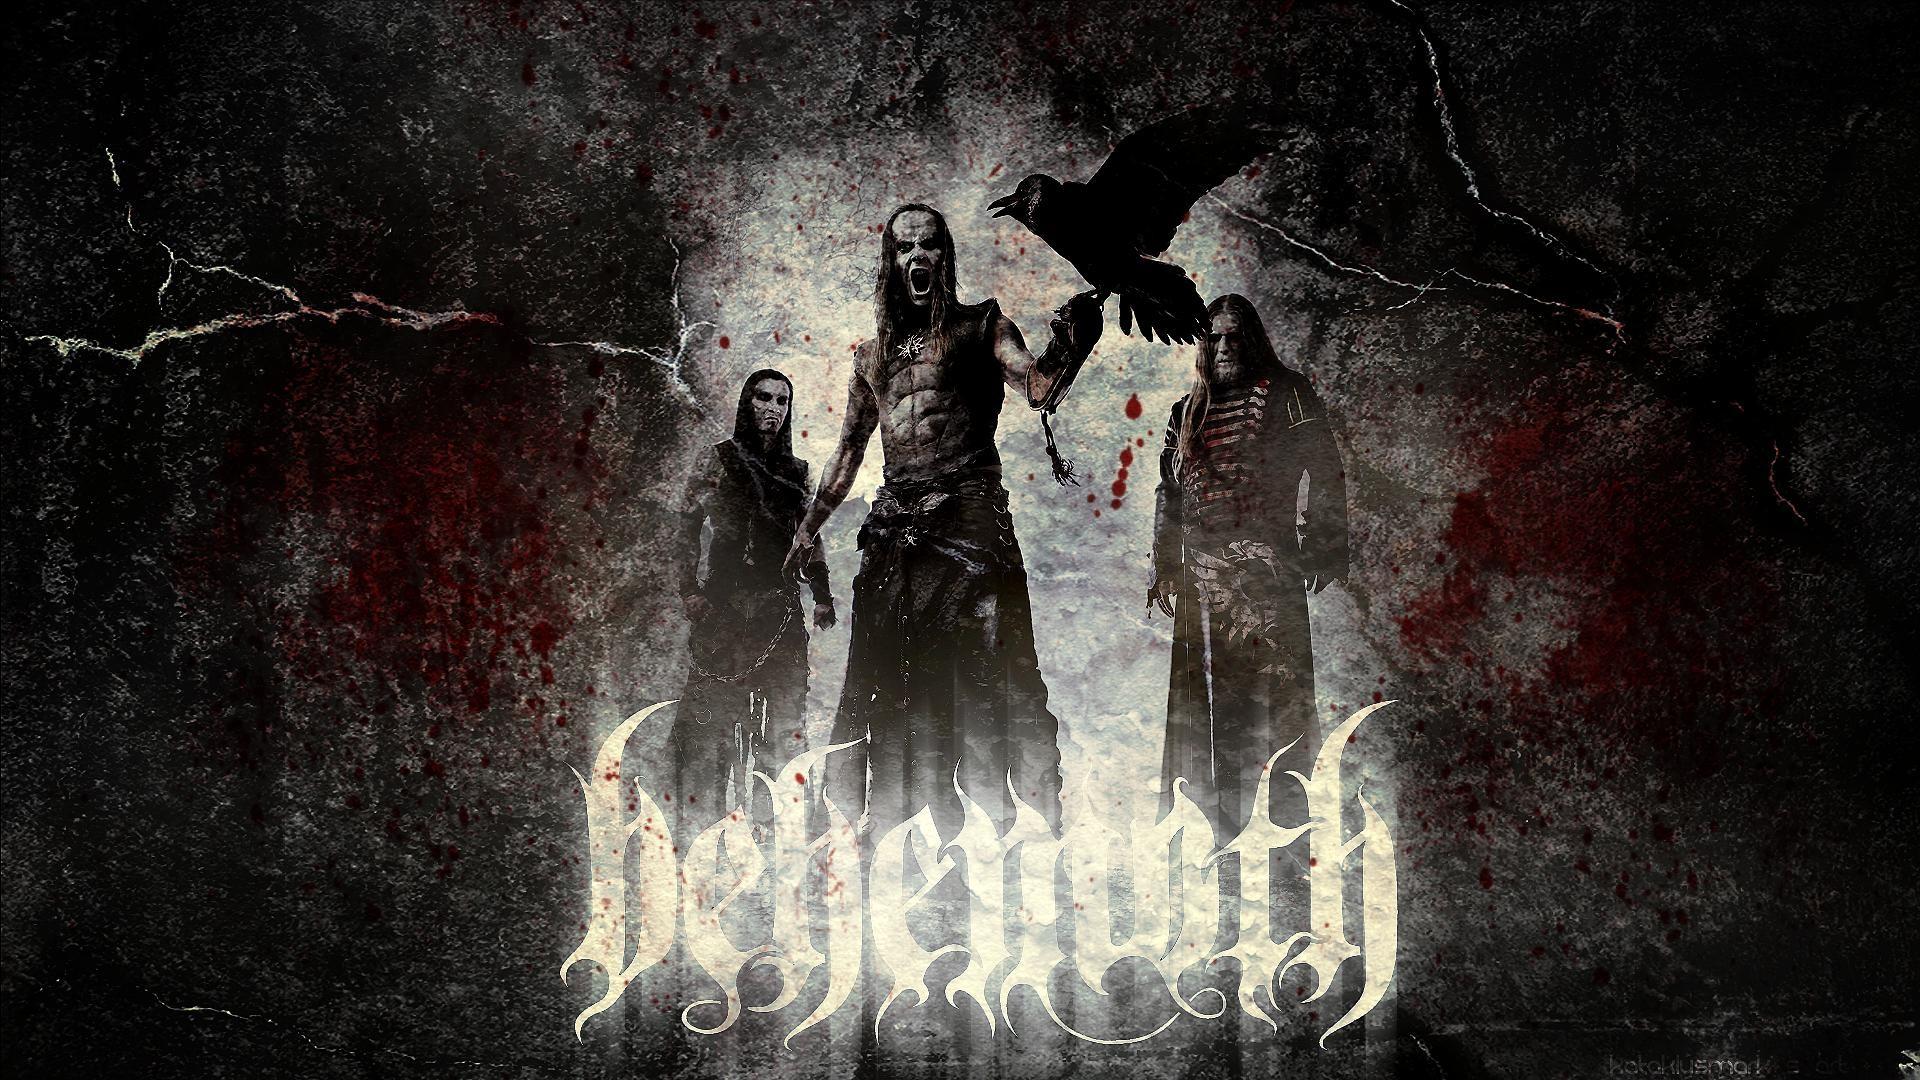 Satanist wallpaper 53 images - Death metal wallpaper hd ...